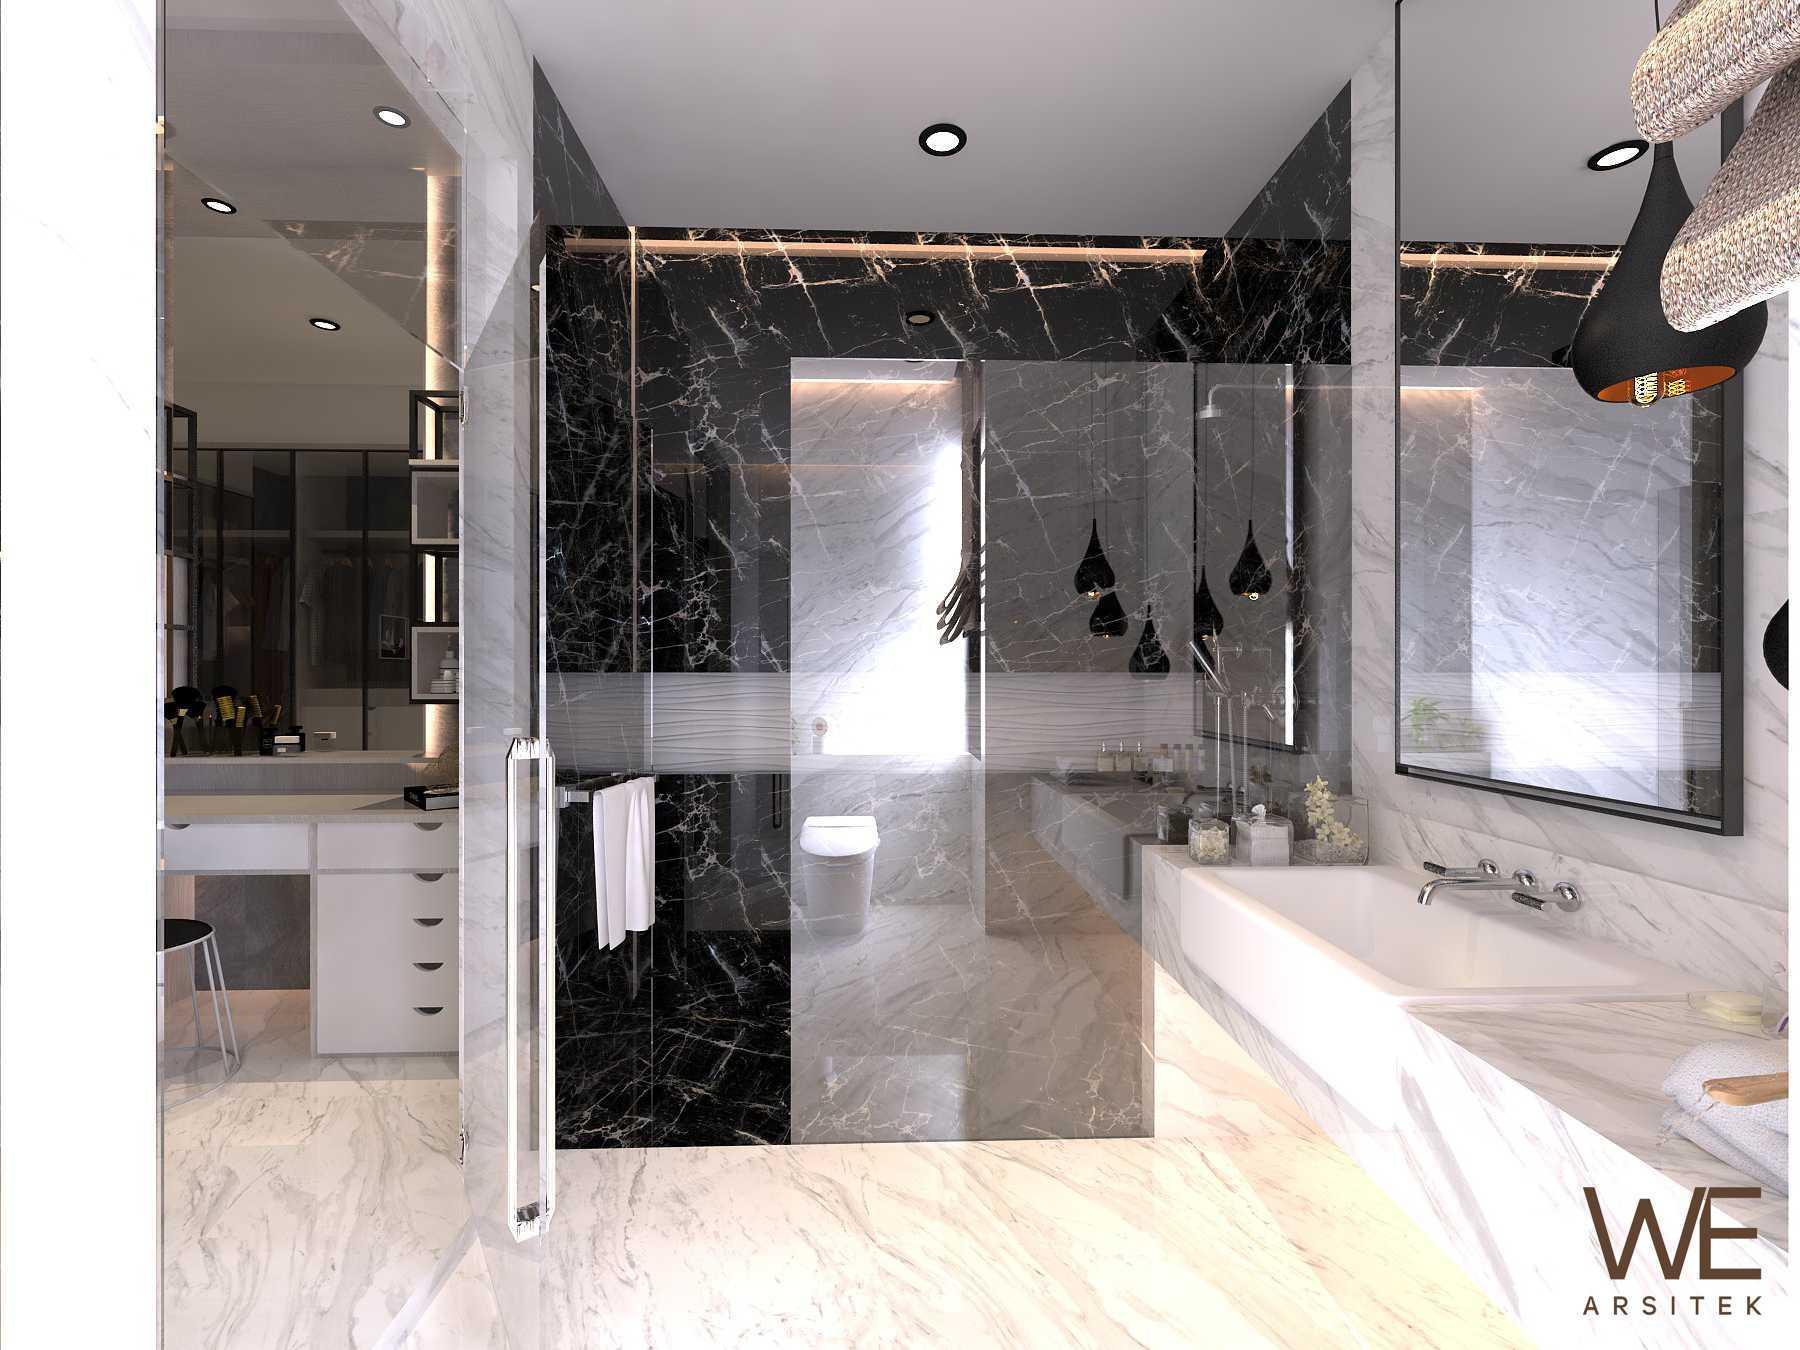 We Arsitek Li Residence - Contemporary Kota Medan, Sumatera Utara, Indonesia Kota Medan, Sumatera Utara, Indonesia Bathroom   45720